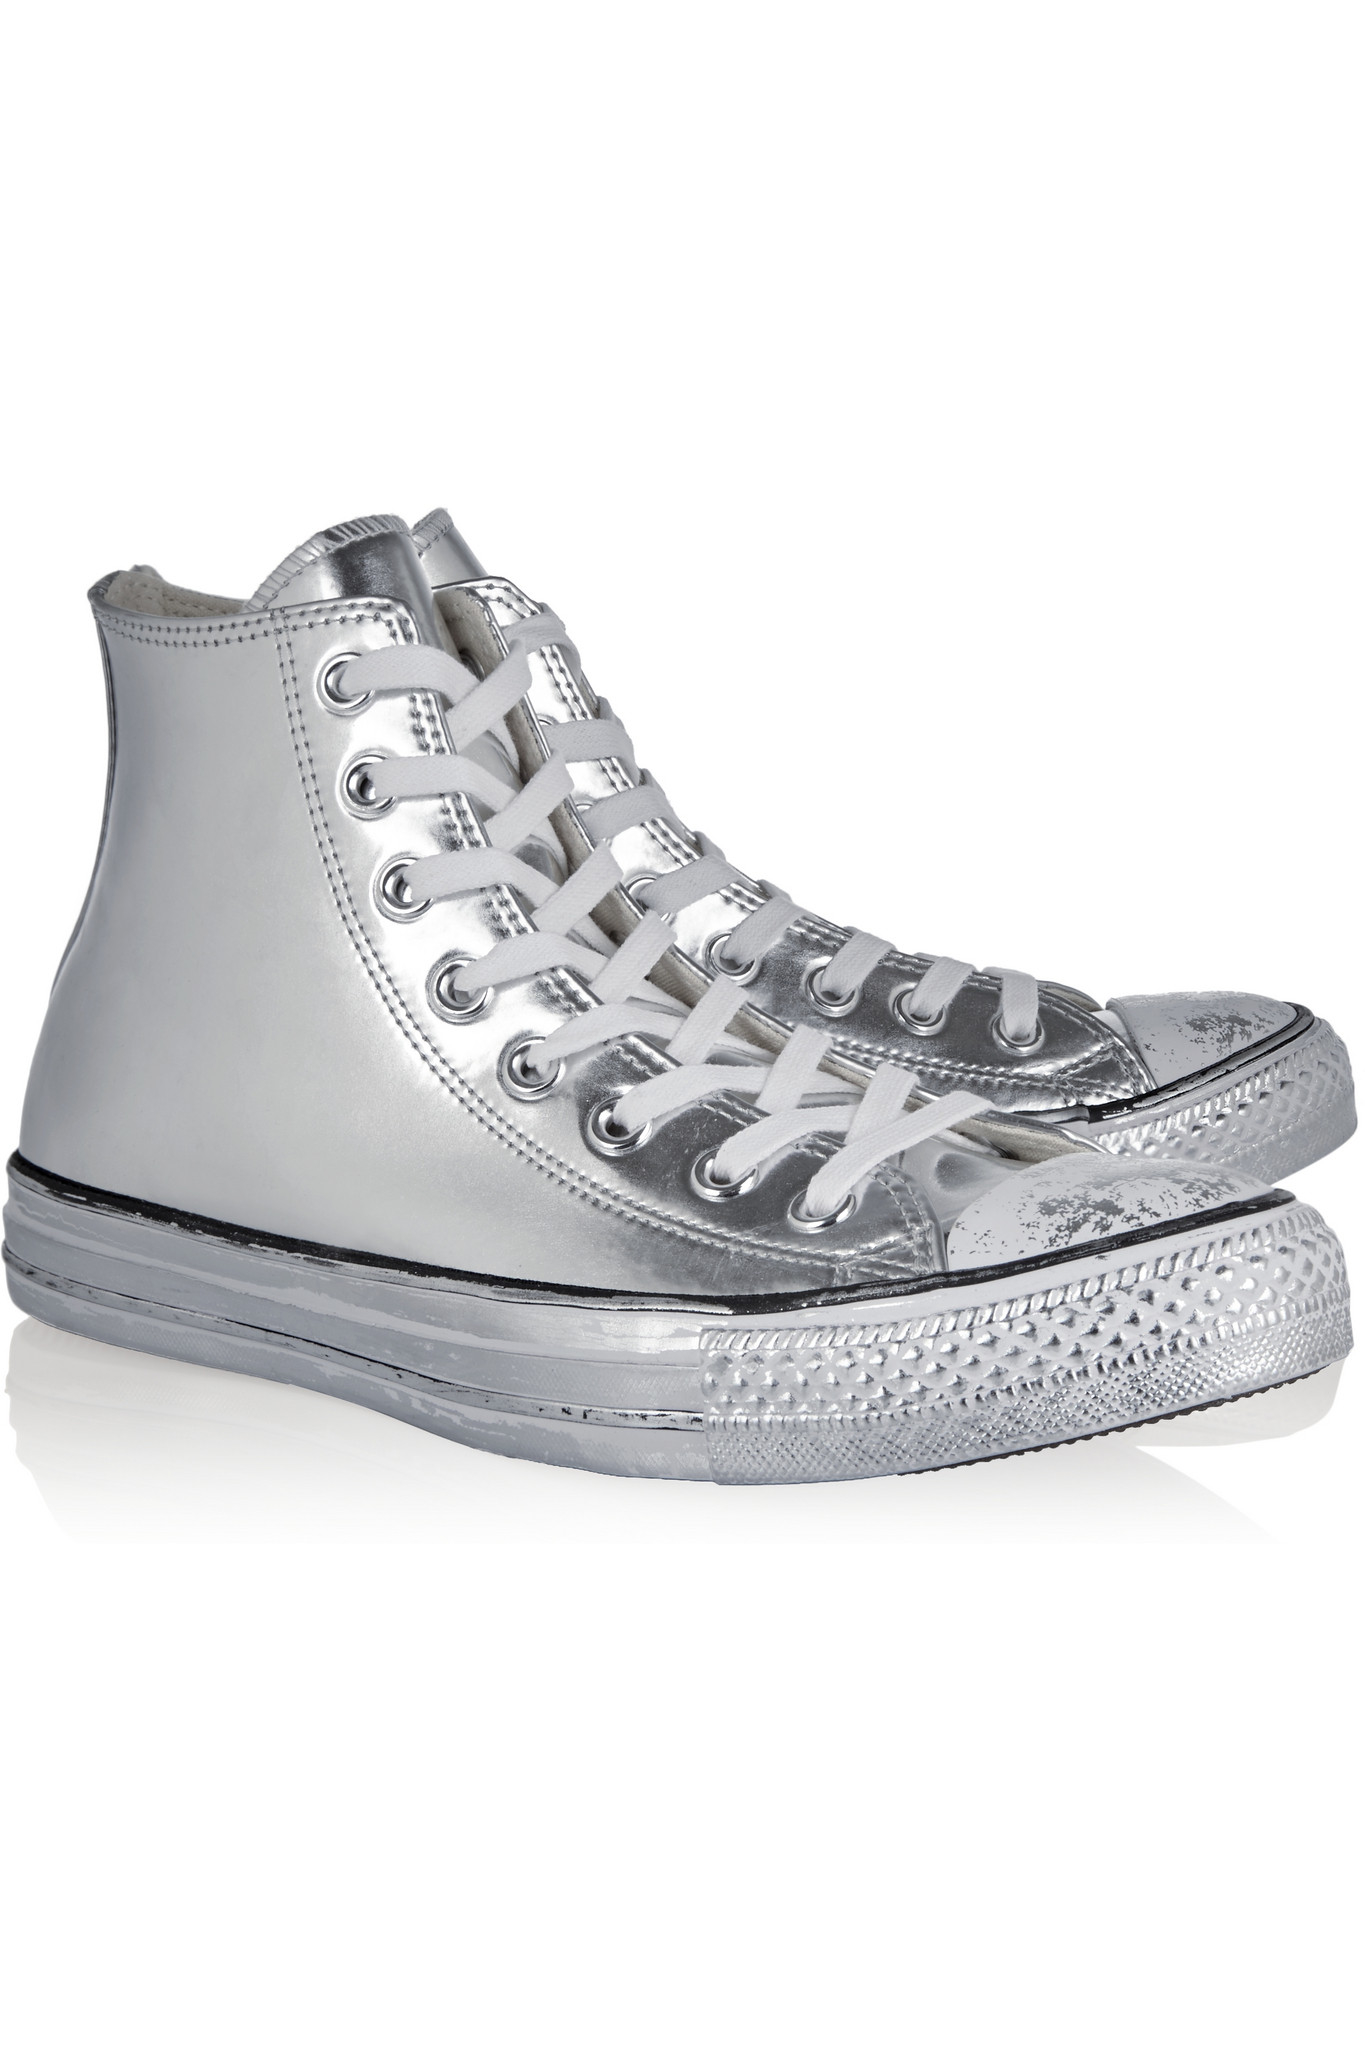 Converse Chuck Taylor All Star Metallic High Top NWT